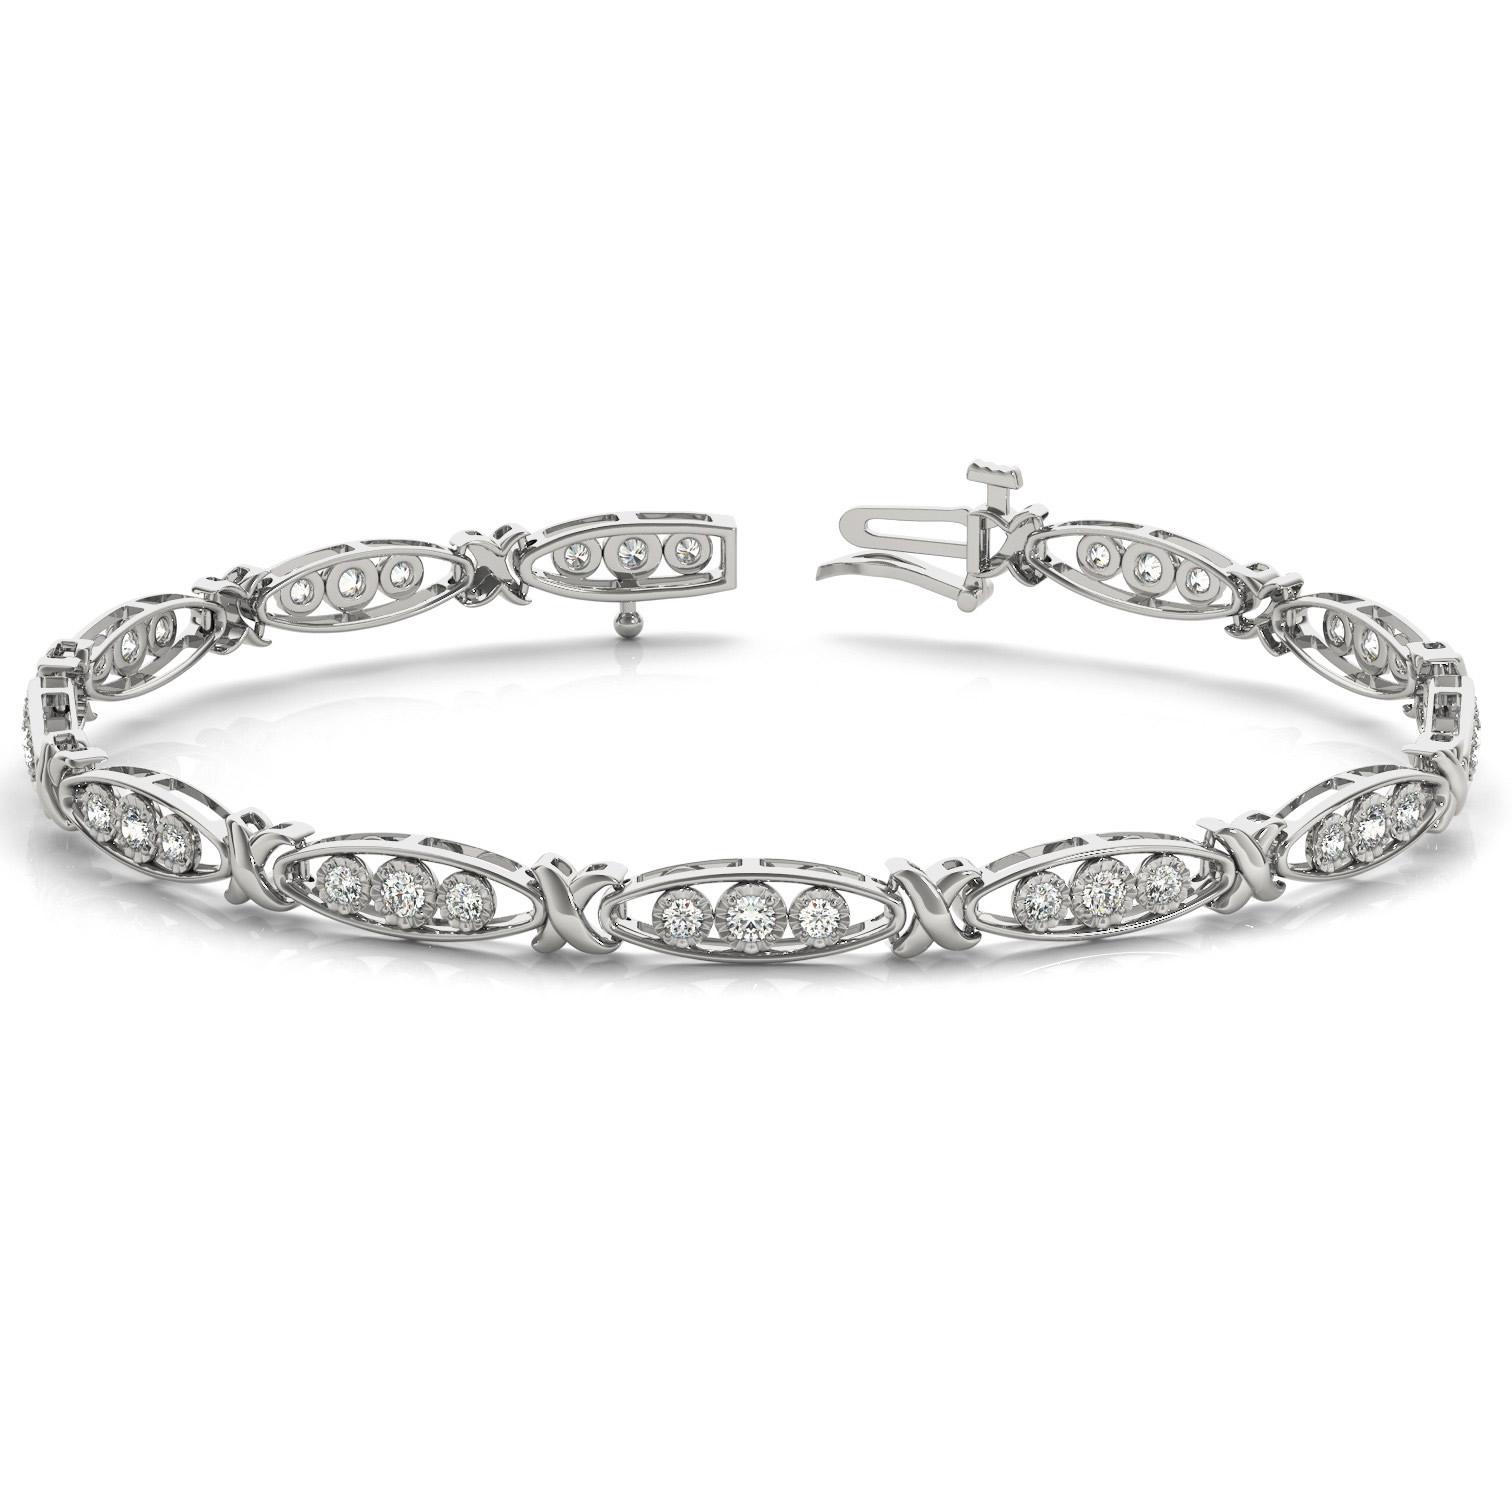 1/3 Carat TW Diamond Three Stone Bracelet in 10K White Gold